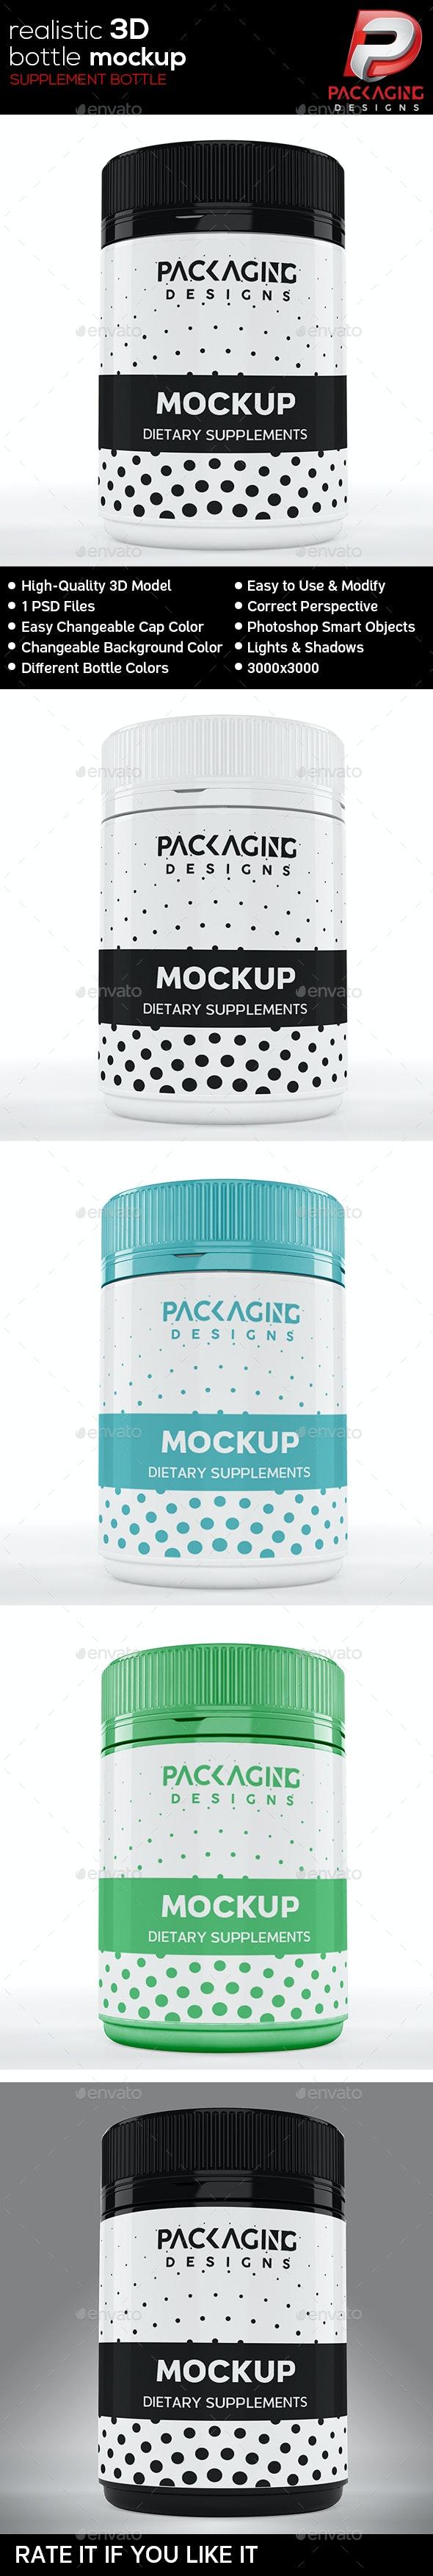 Realistic 3D Supplement Bottle Mock-Up-7 - Packaging Product Mock-Ups